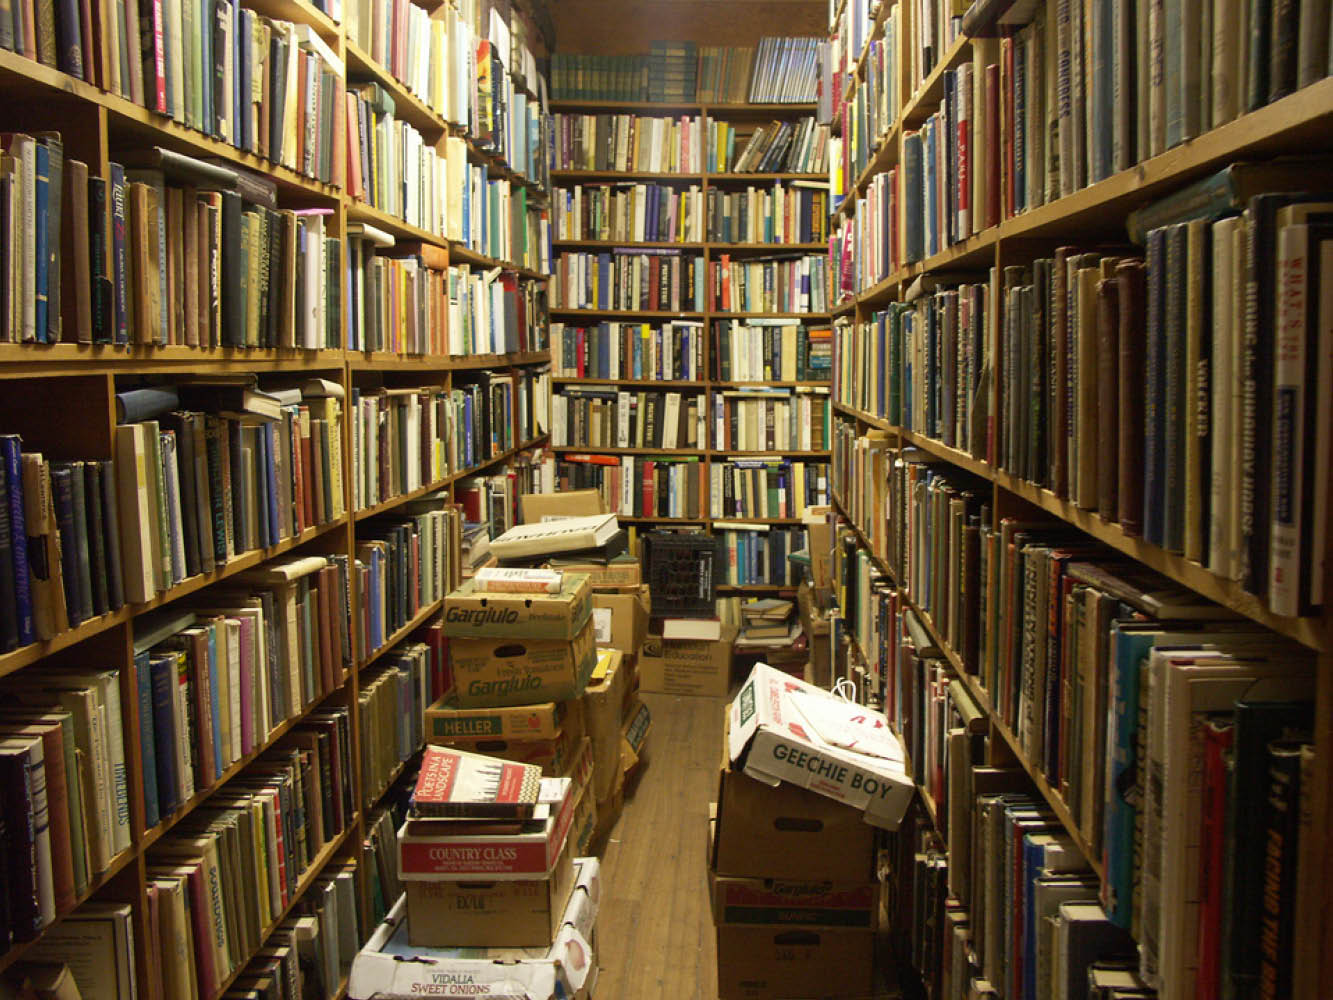 Более 500 книг подарили вологжане областной библиотеке имени Бабушкина